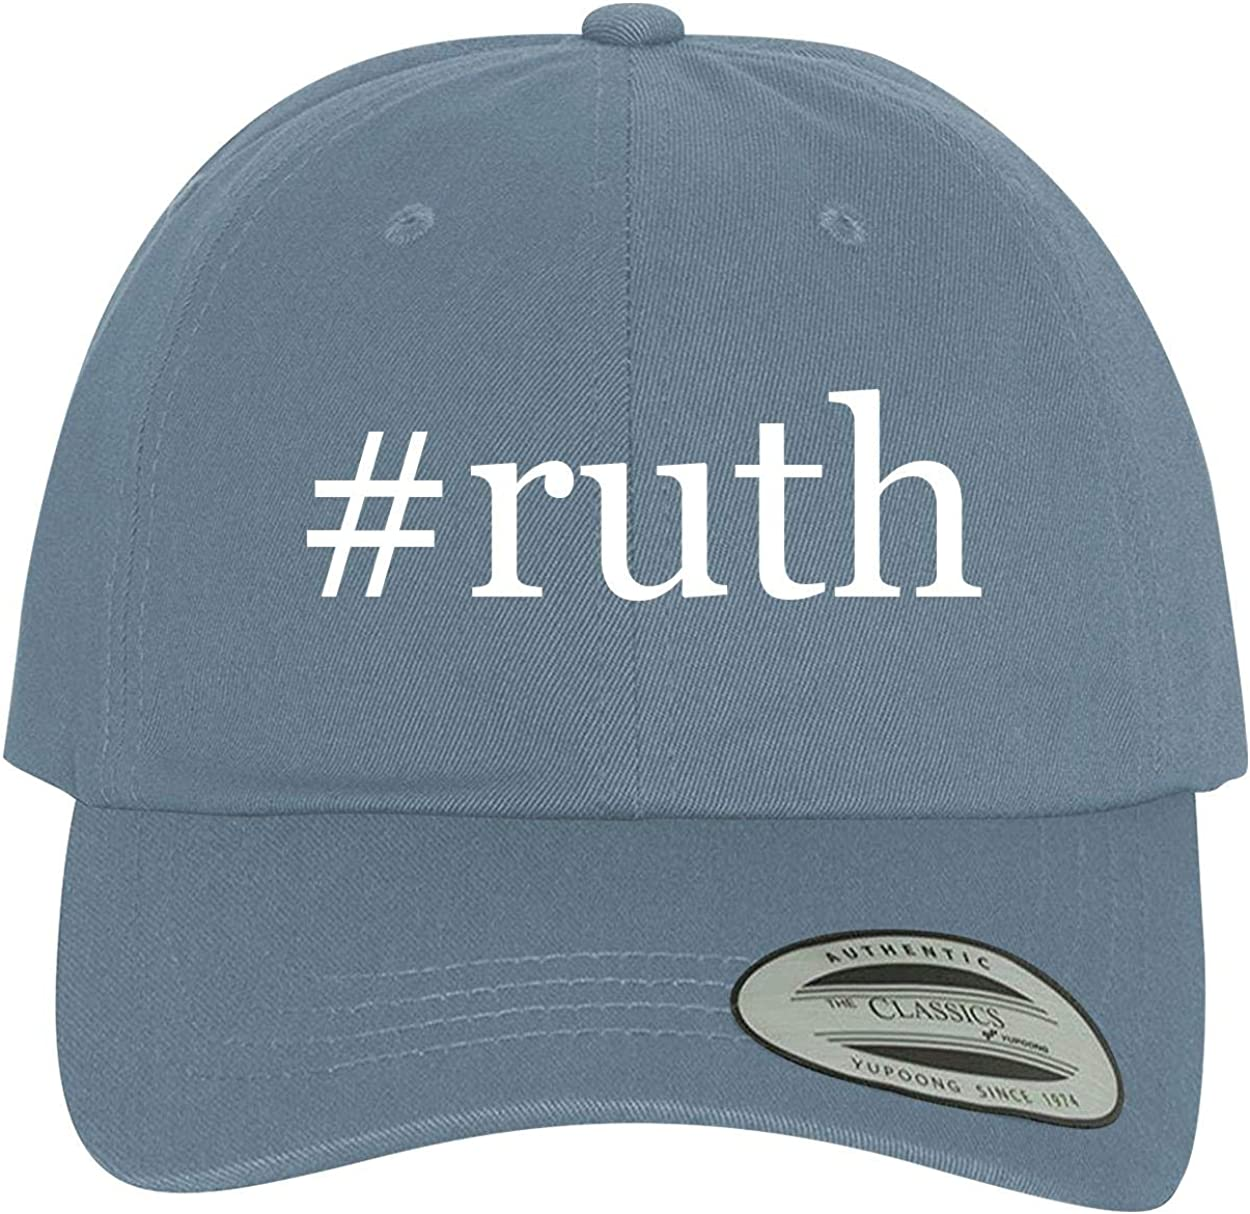 Comfortable Dad Hat Baseball Cap BH Cool Designs #Ruth